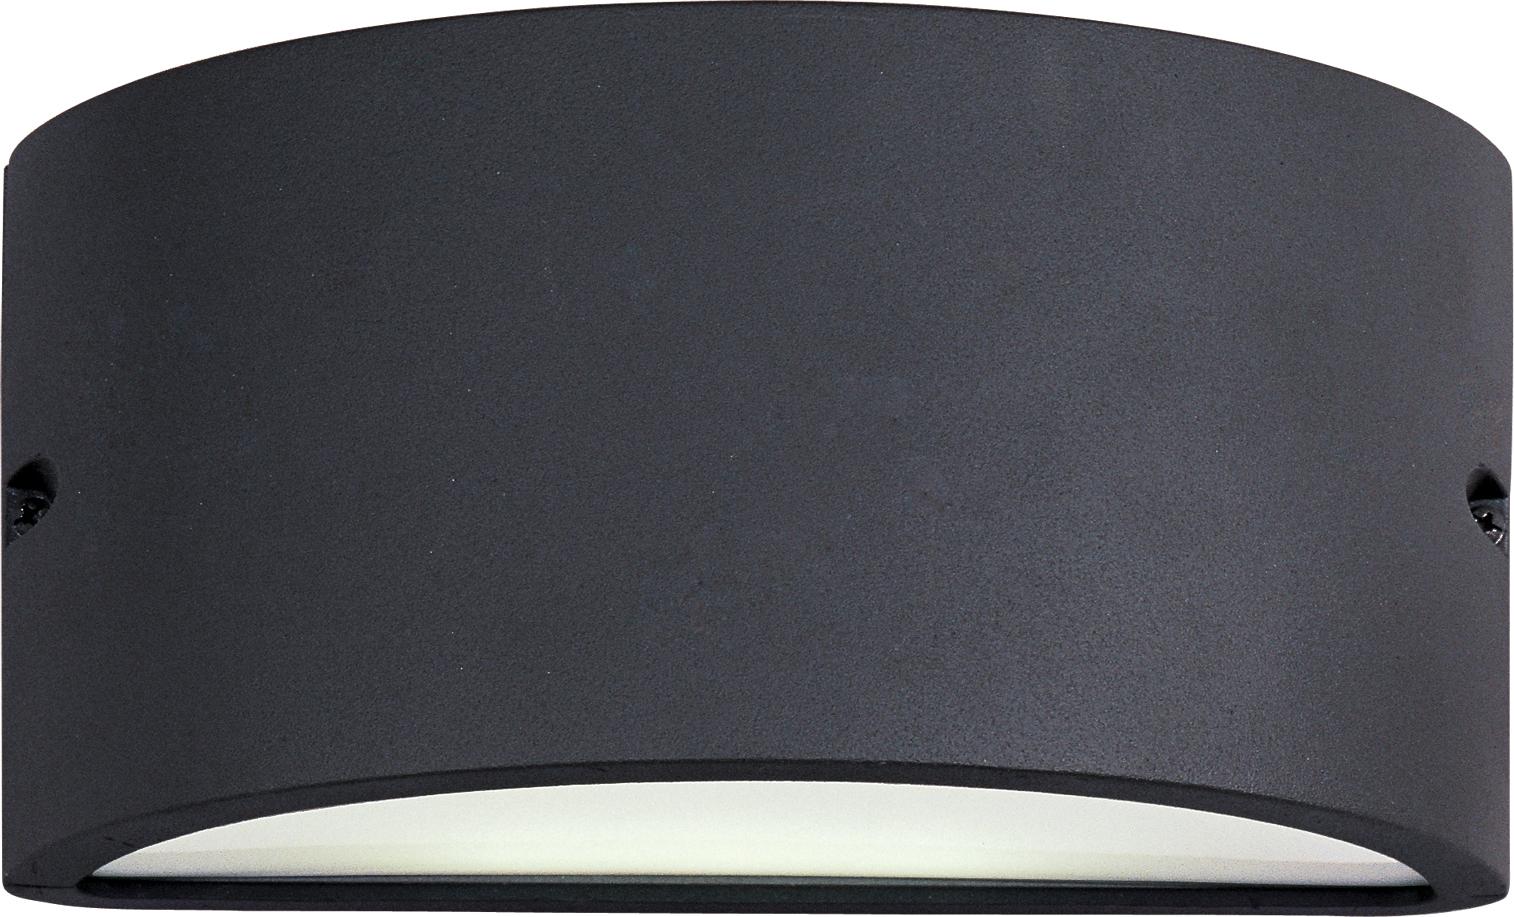 Zenith LED Wall Sconce | Maxim Lighting